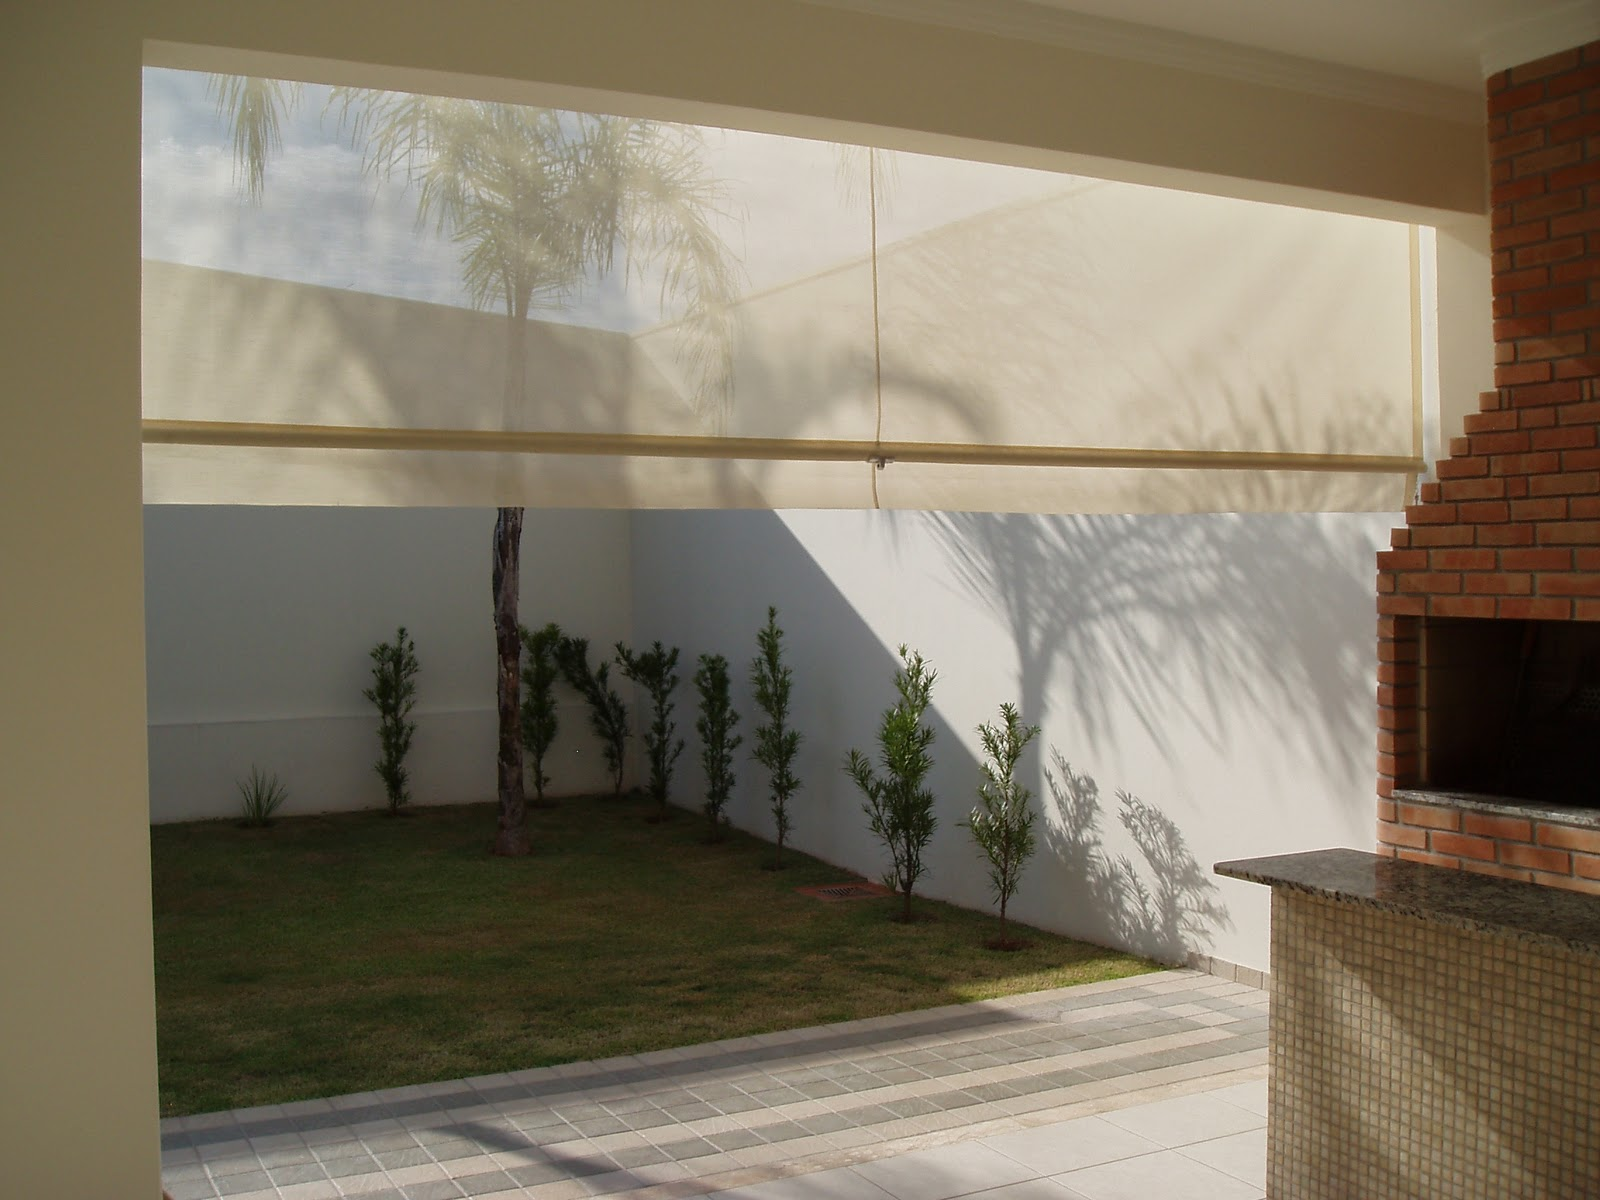 Toldos cortinas em tela solar for Tela para toldos